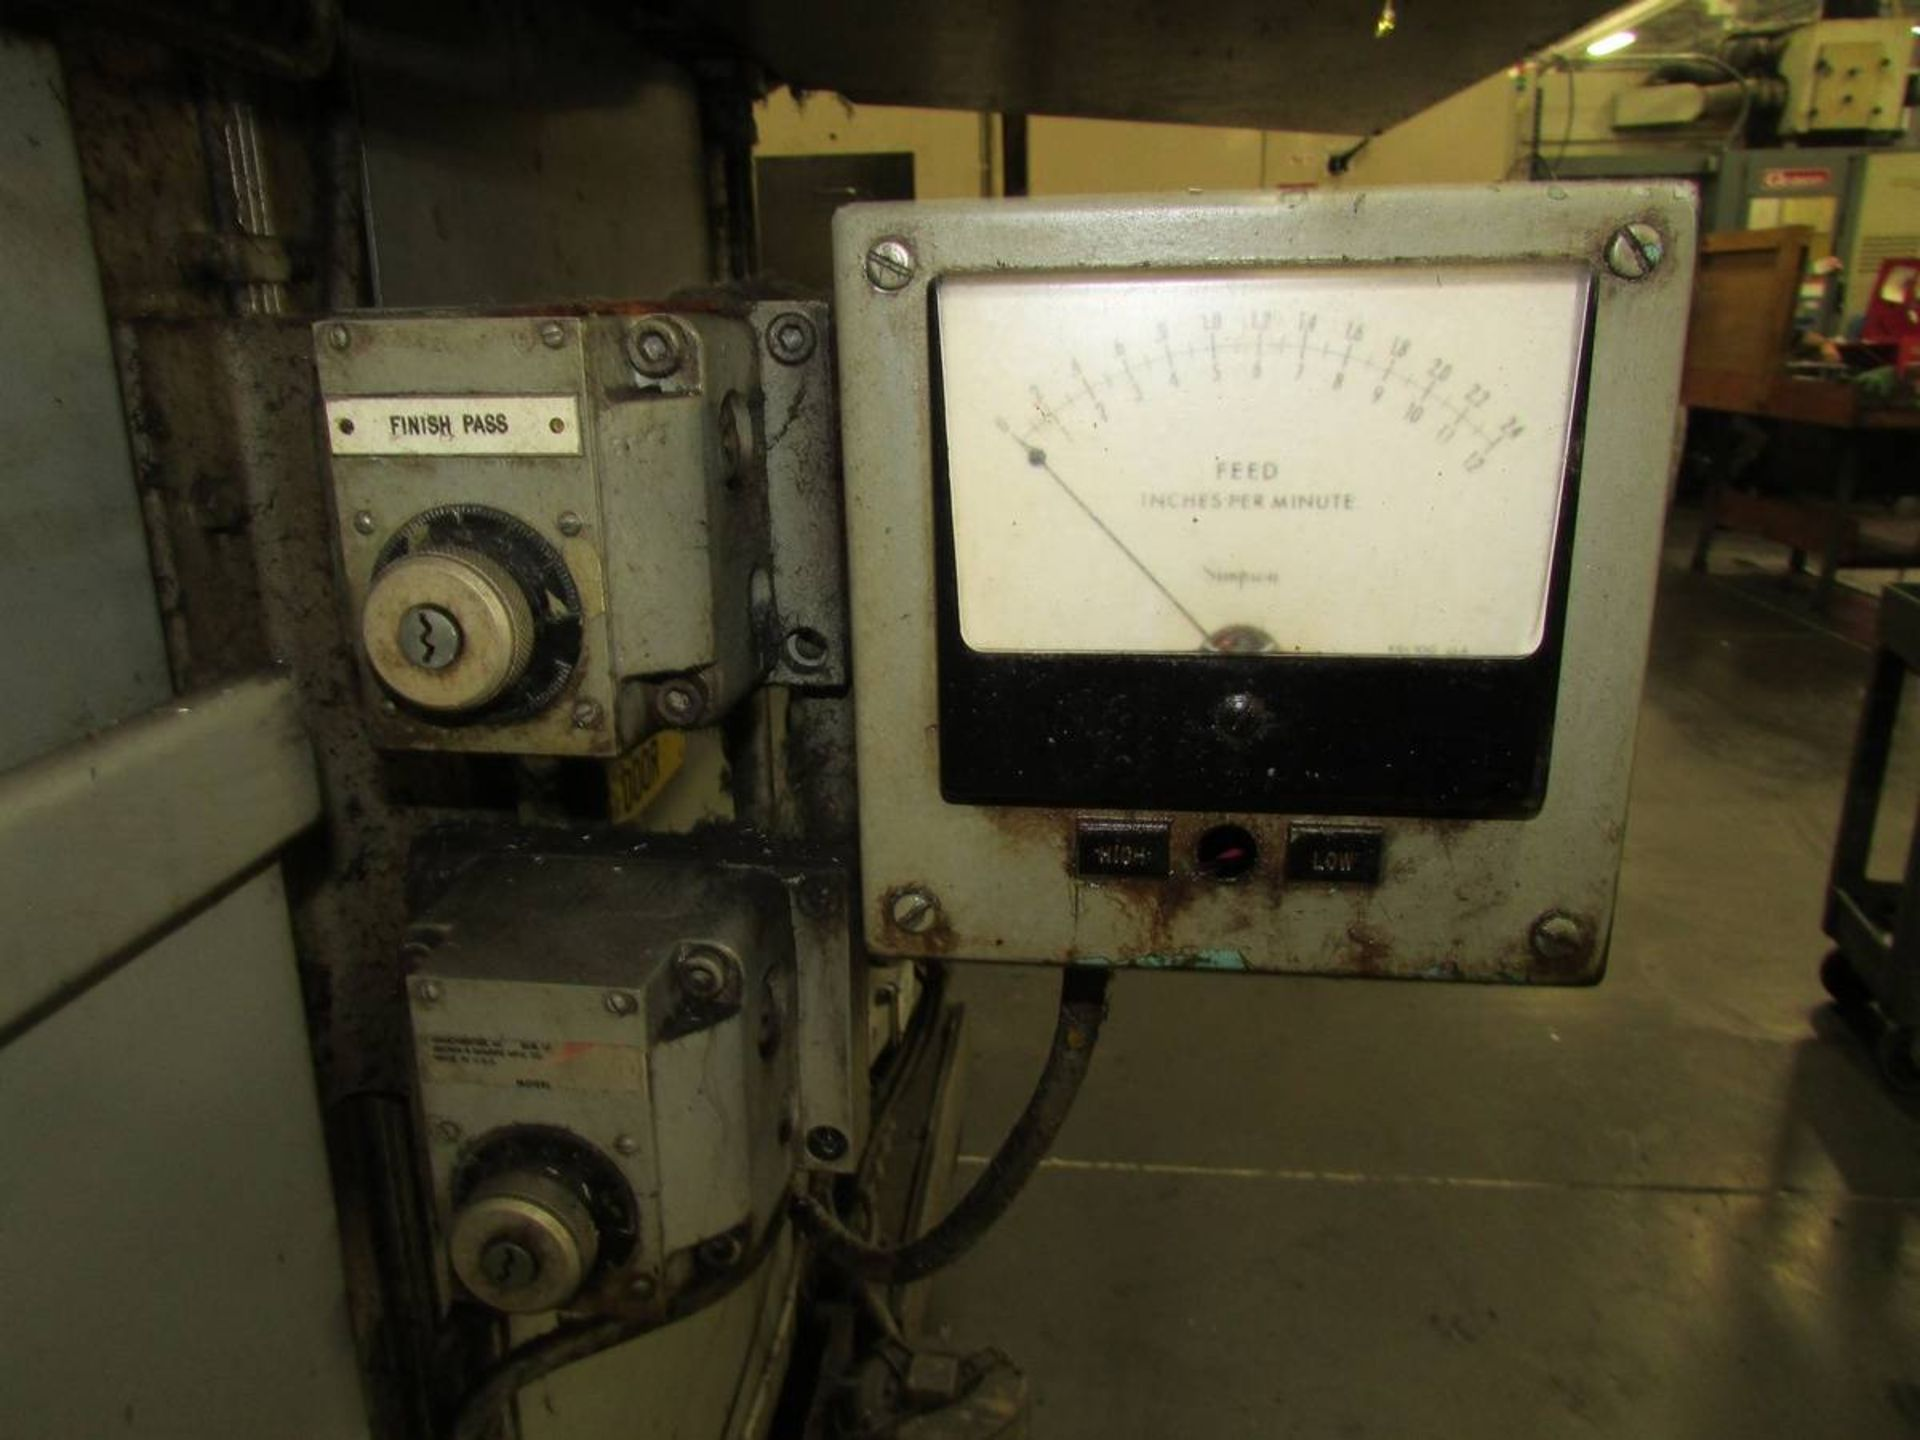 Cleveland/ Waterbury Farrel CR300-612-002 Universal CNC Gear Hobbing Machine - Image 11 of 19